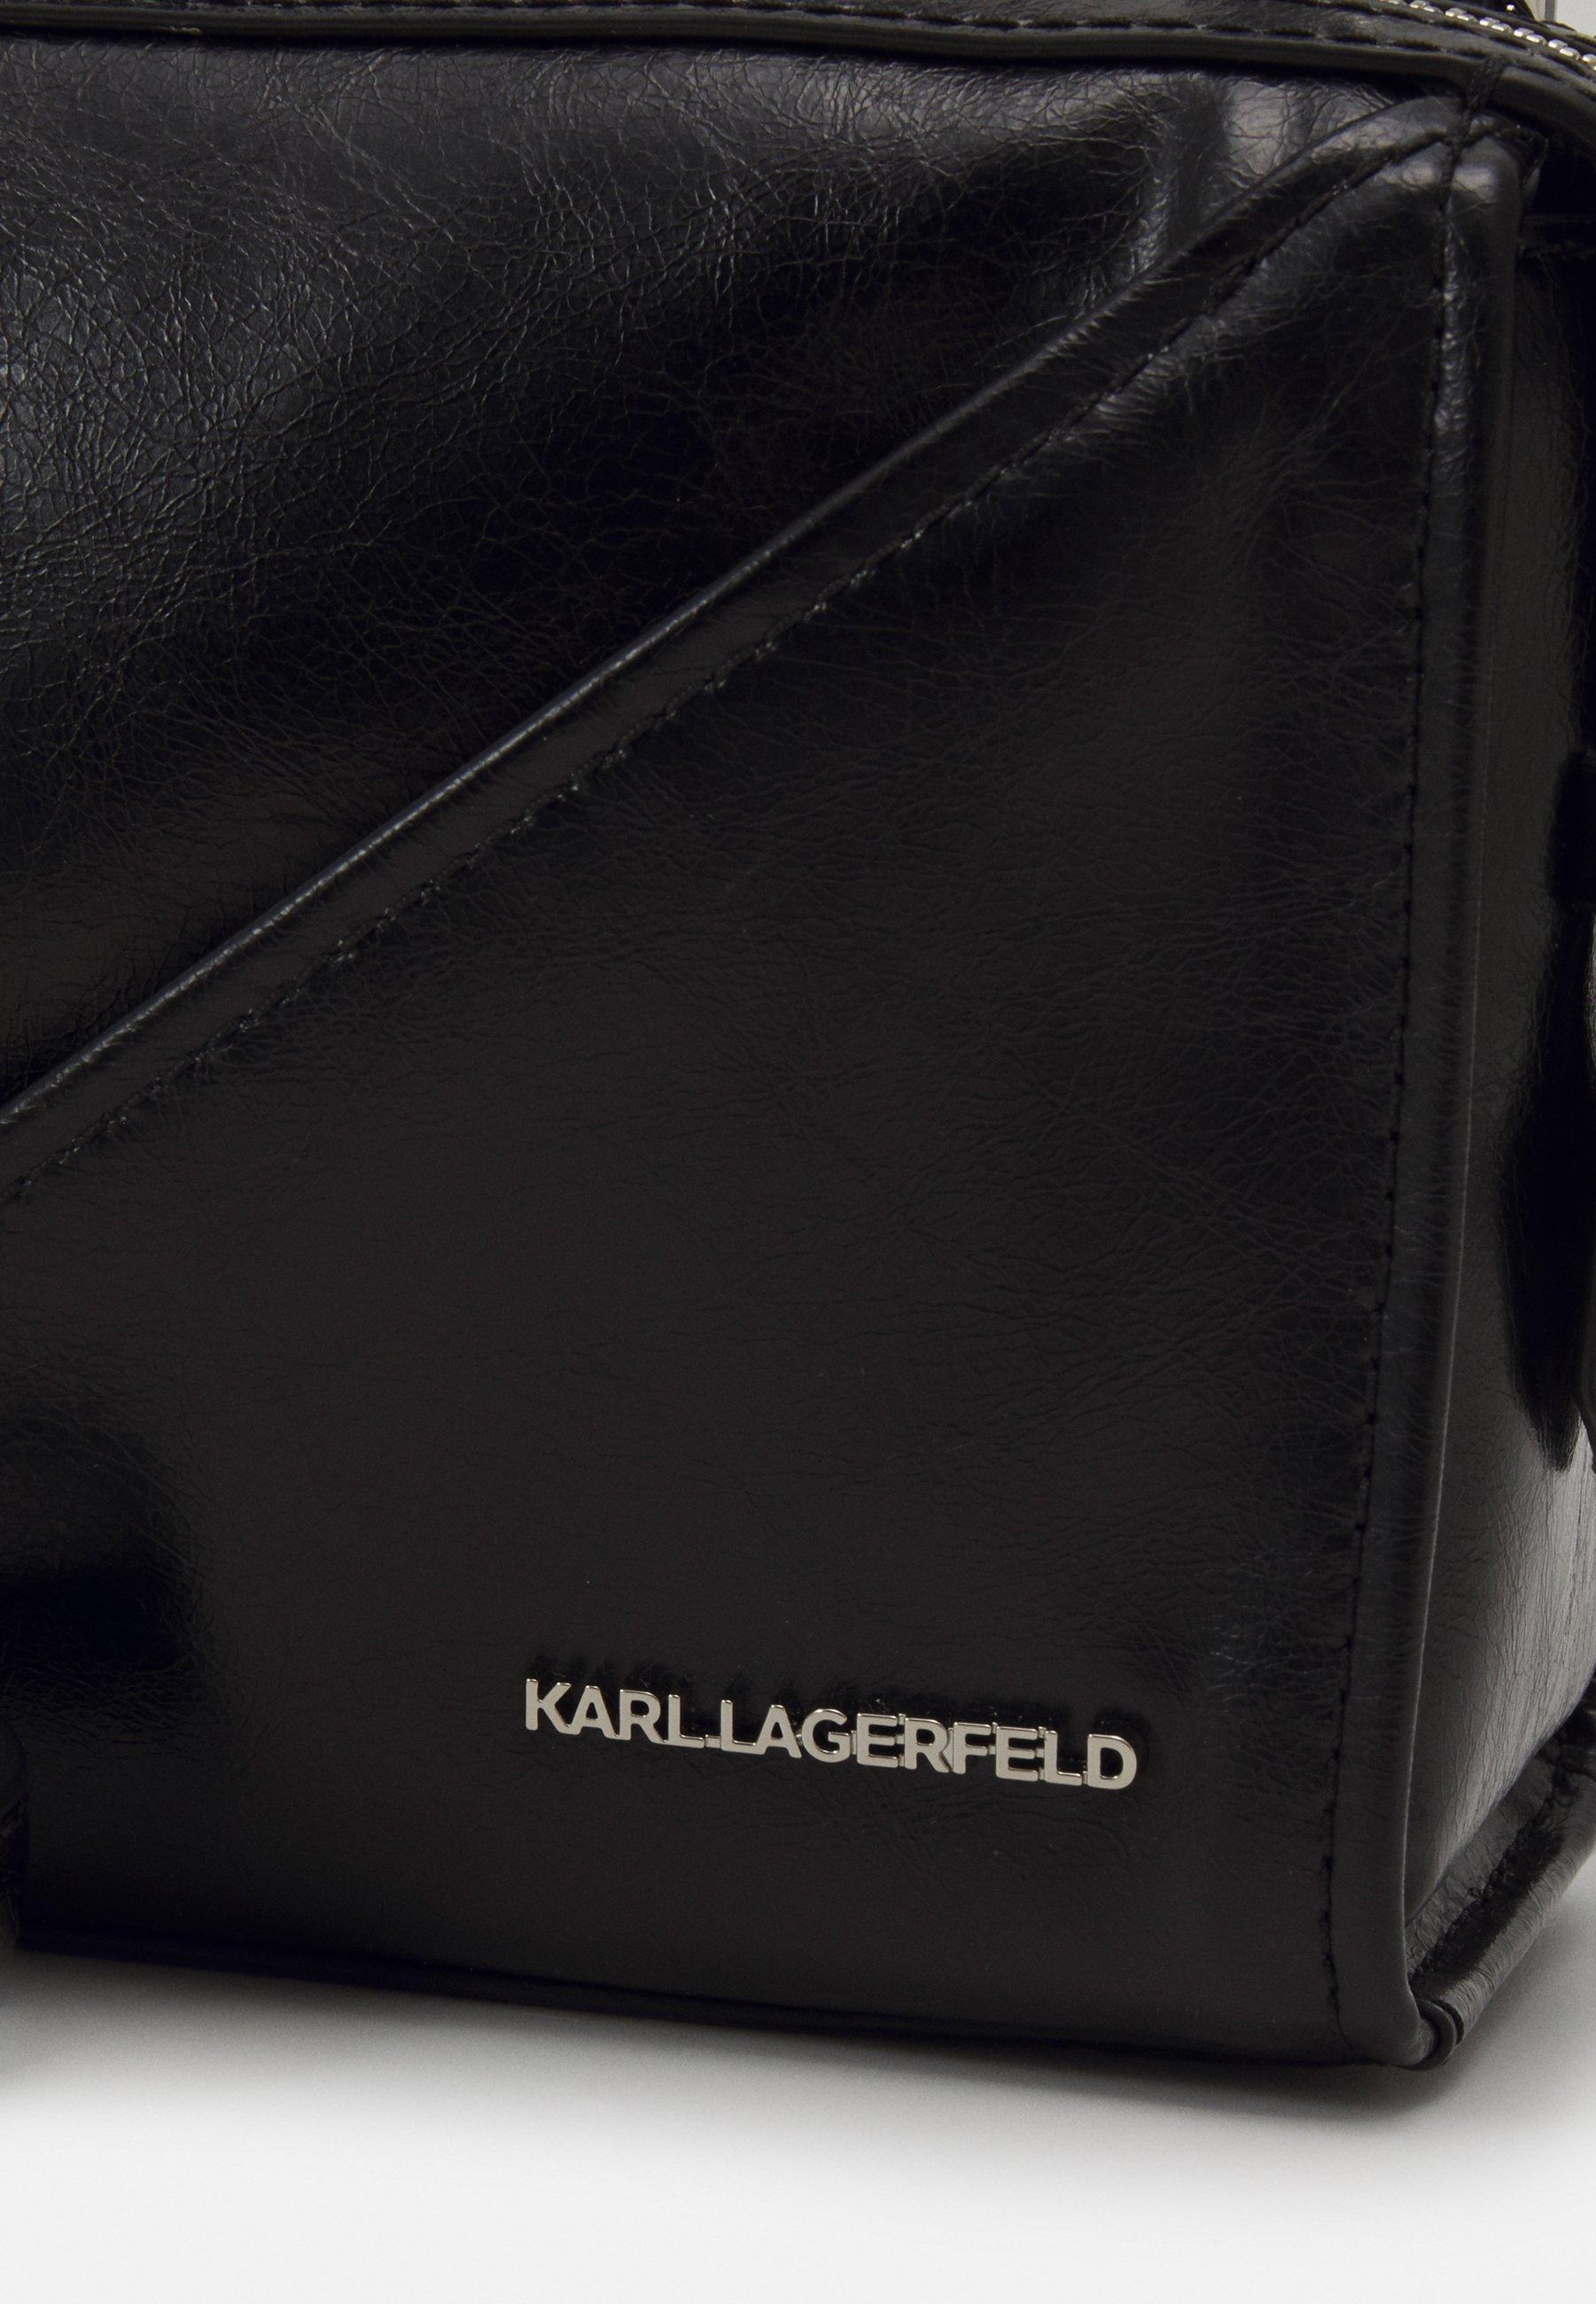 KARL LAGERFELD SLASH SMALL TOP HANDLE - Håndveske - black/svart fy0TyBomaaFgk8V